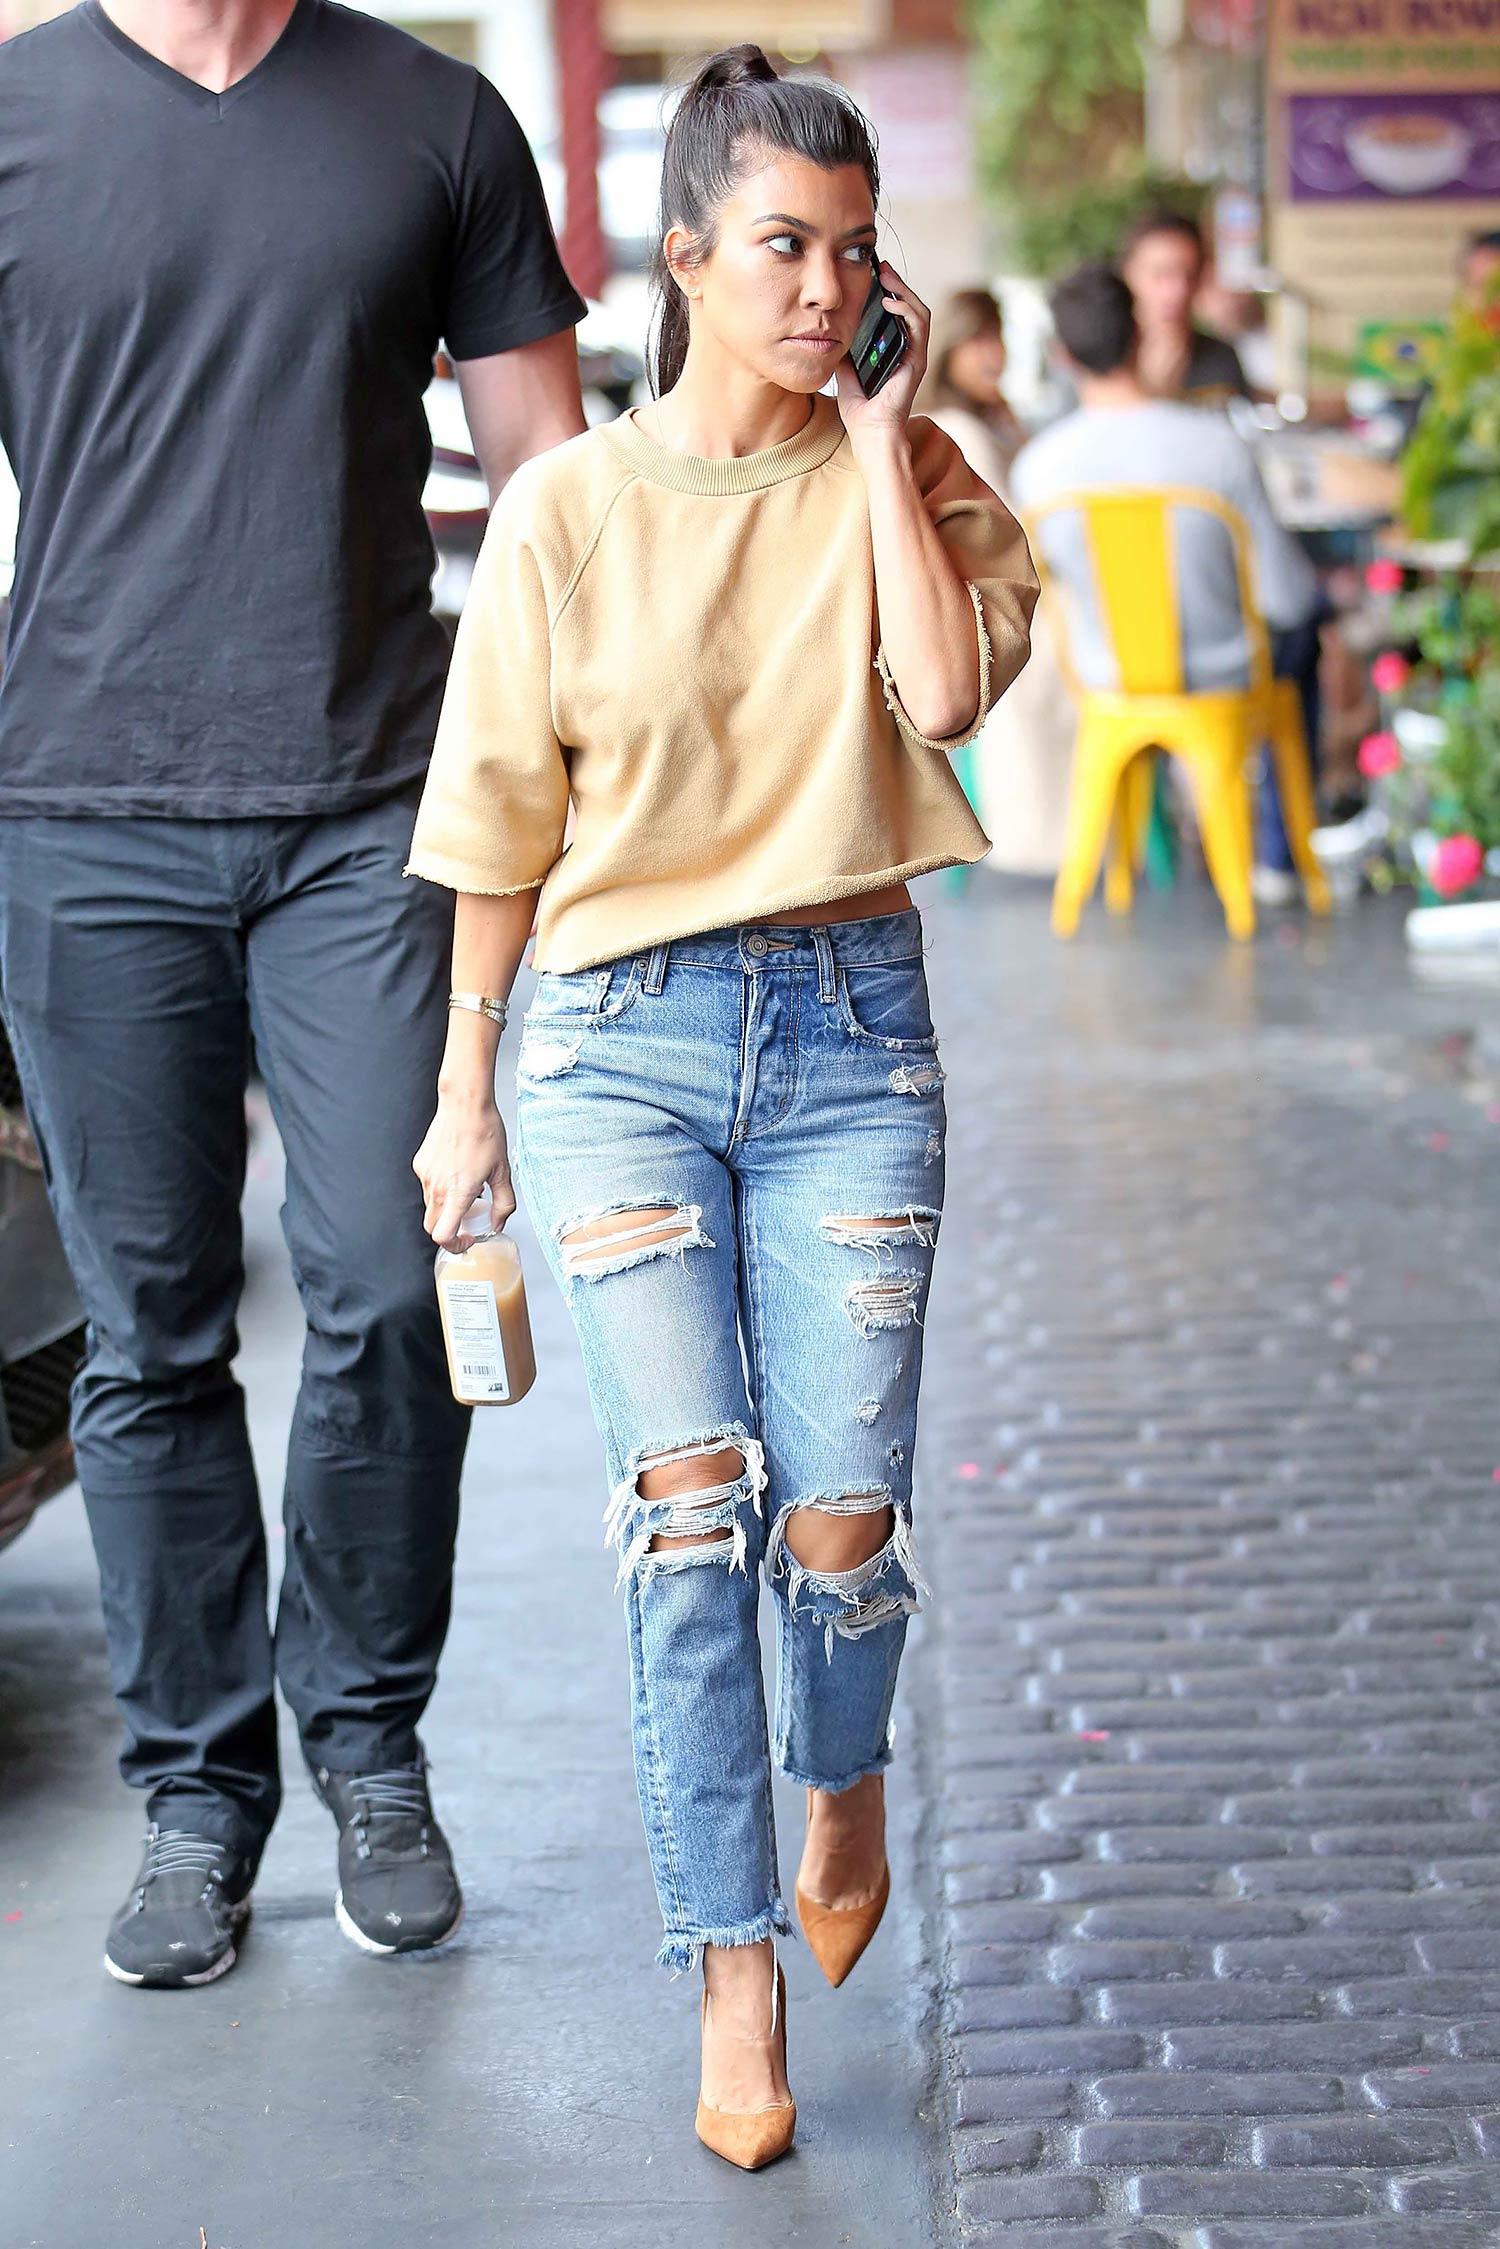 Kourtney Kardashian Wears MOUSSY Jeans